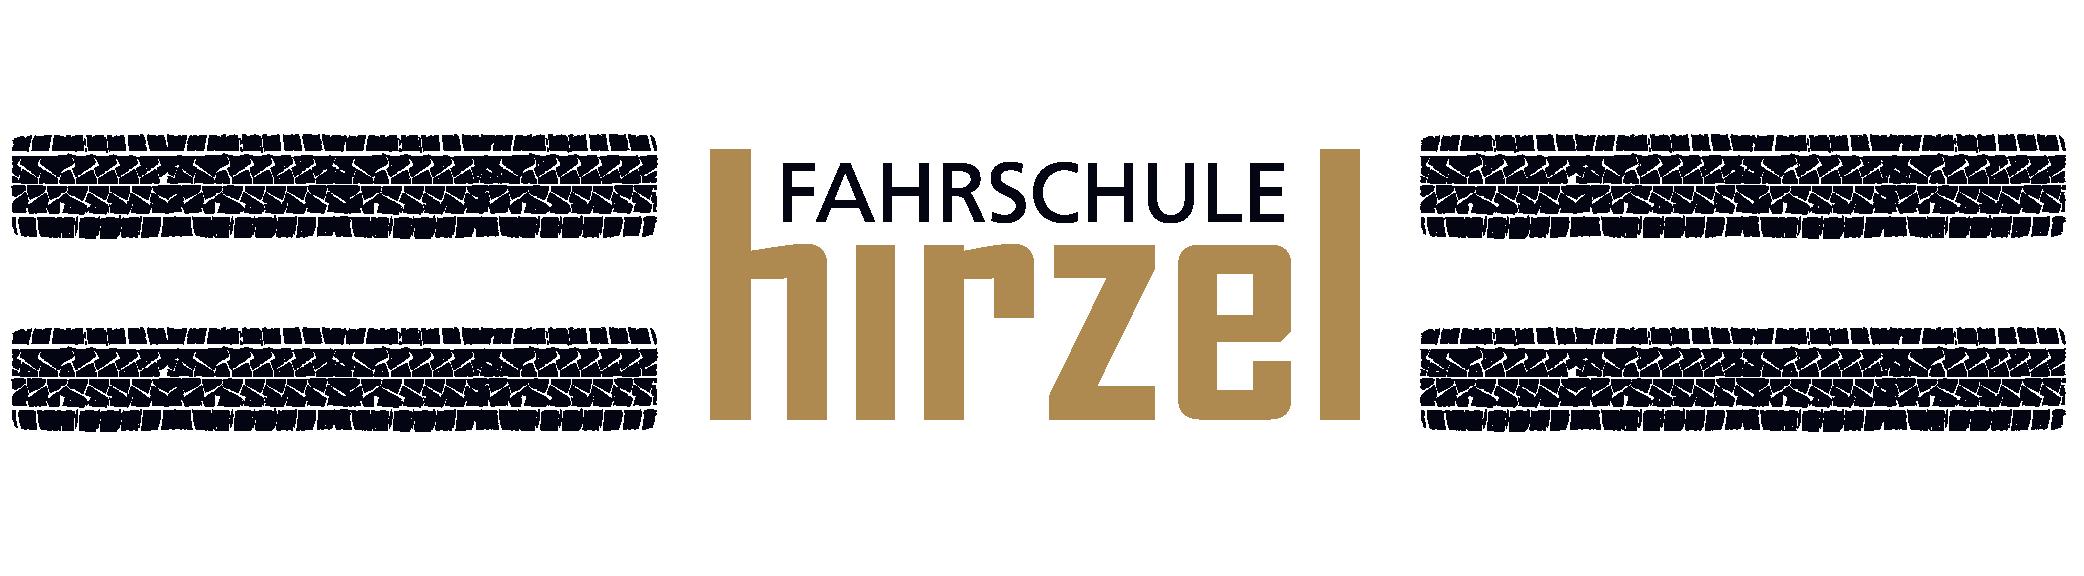 http://zvw.fahrschule-hirzel.de/